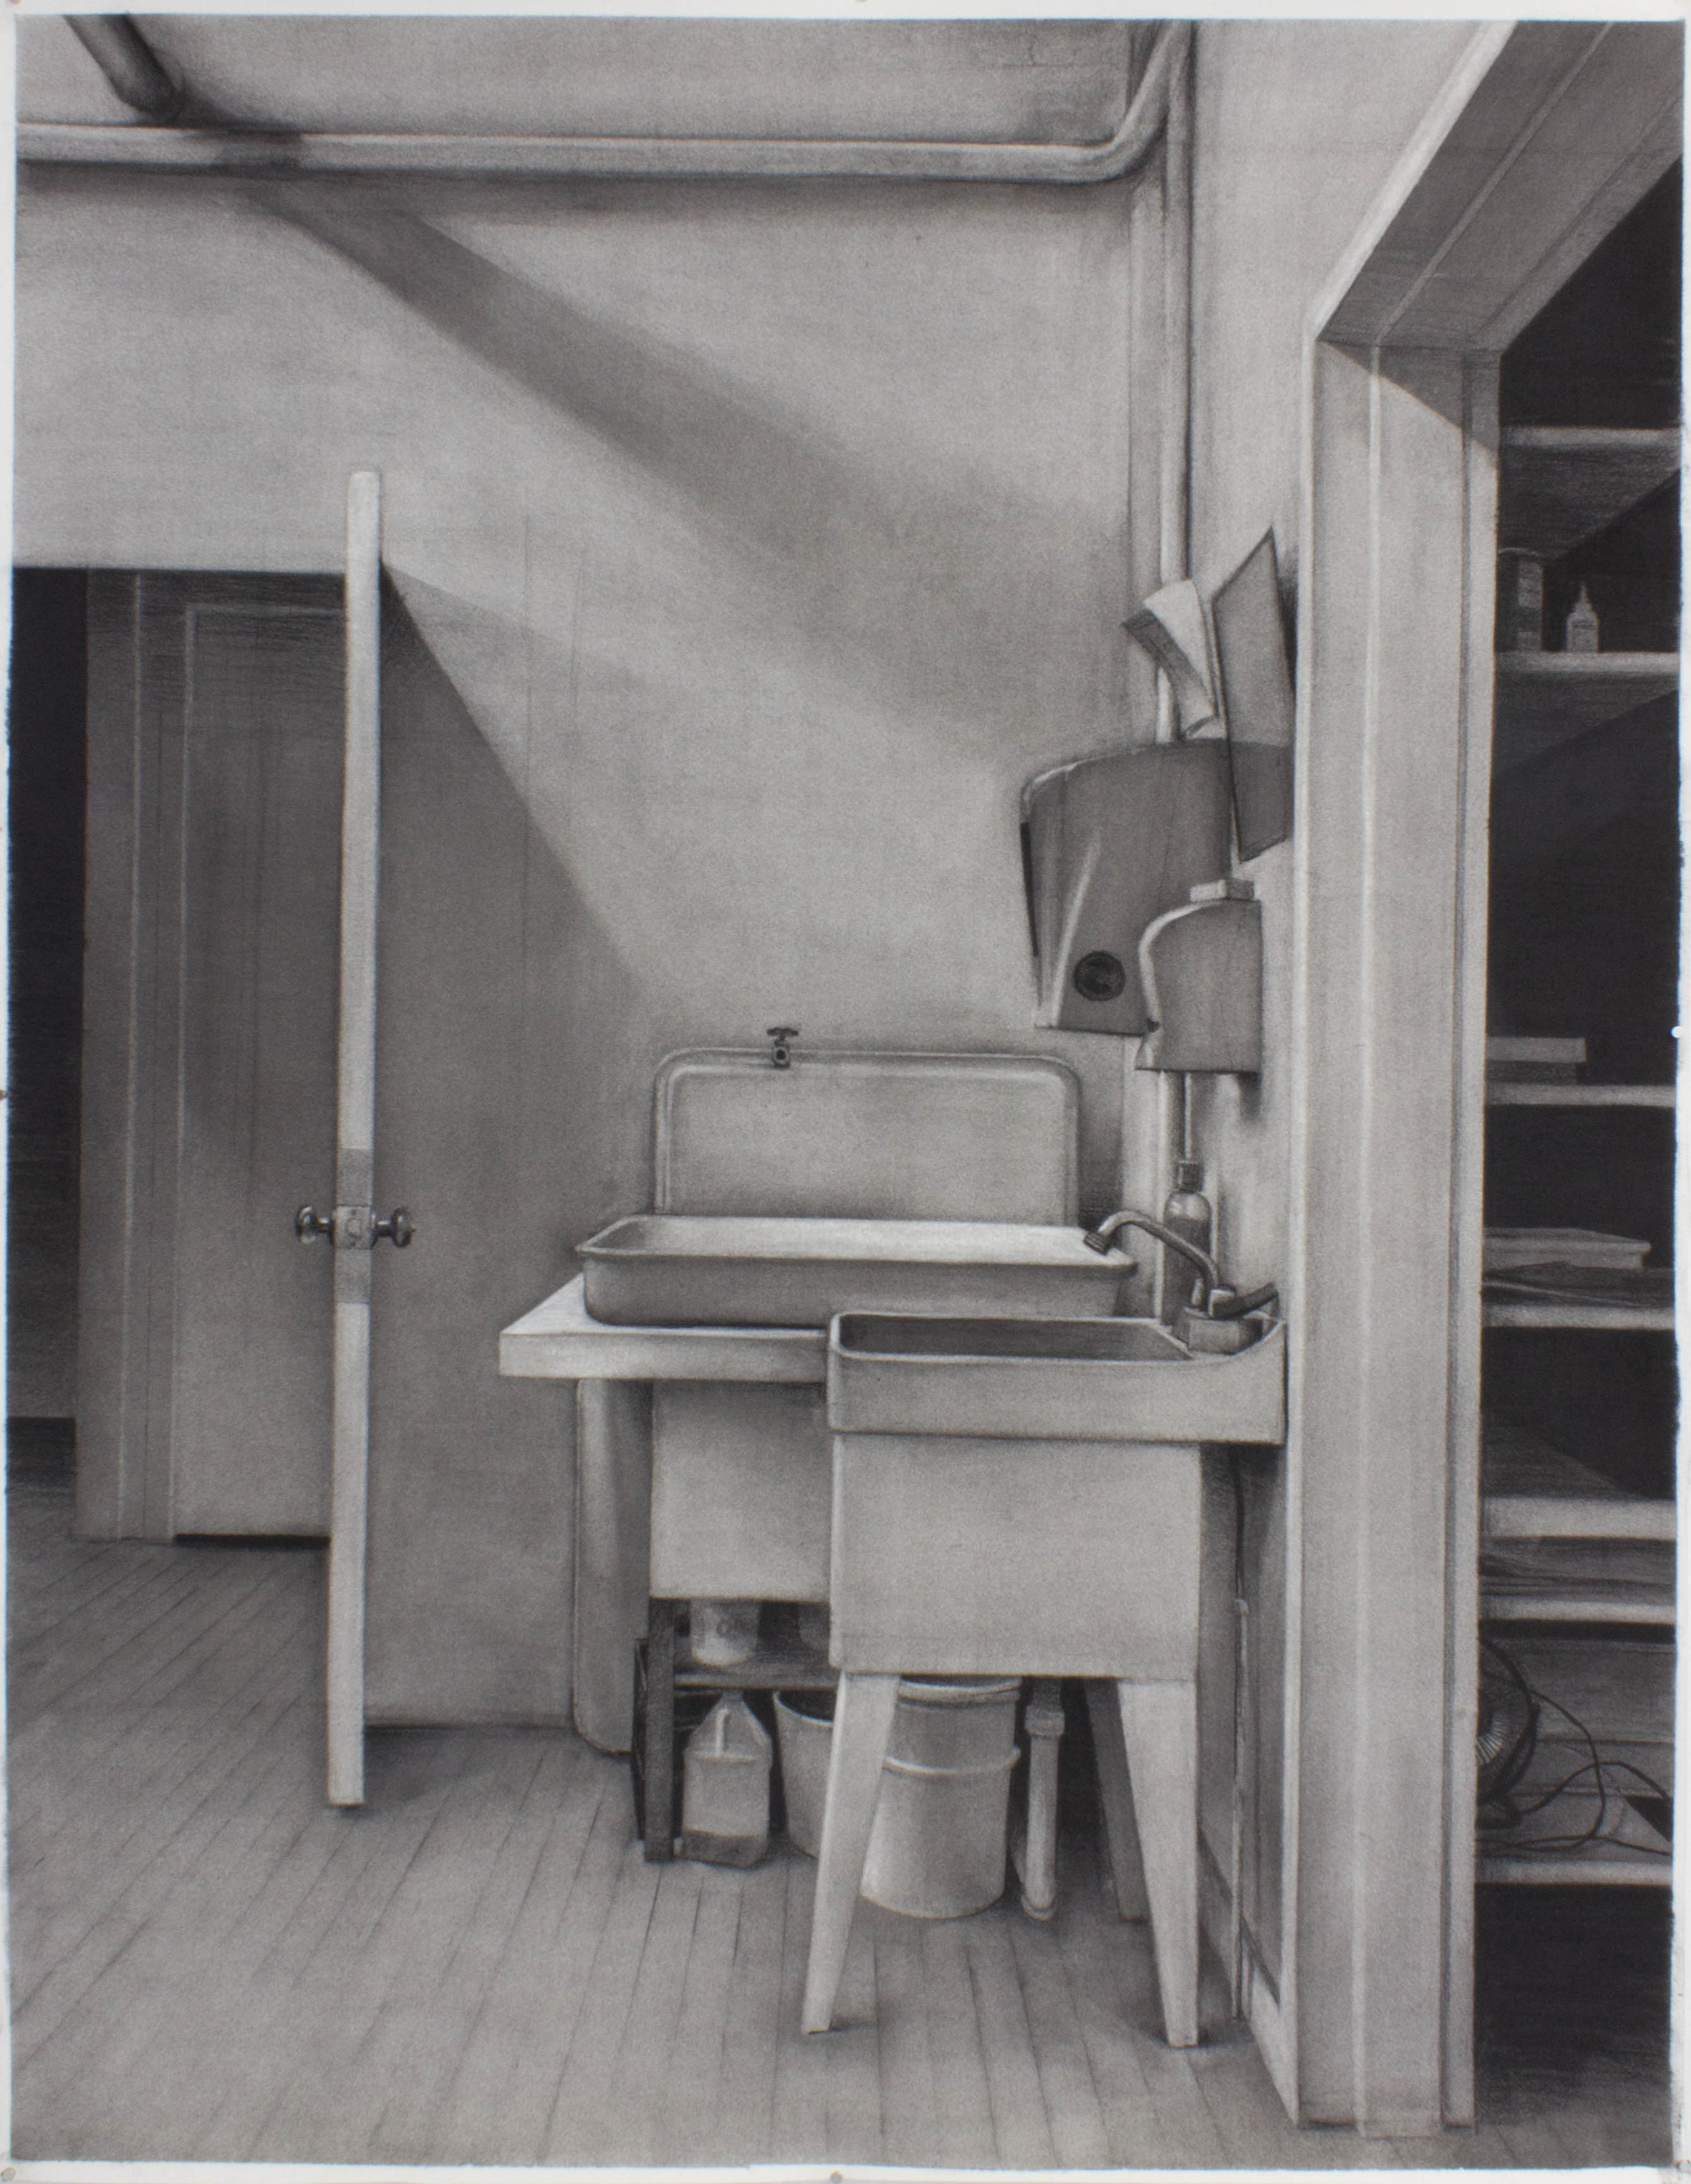 Studio Sink, Johnson, VT